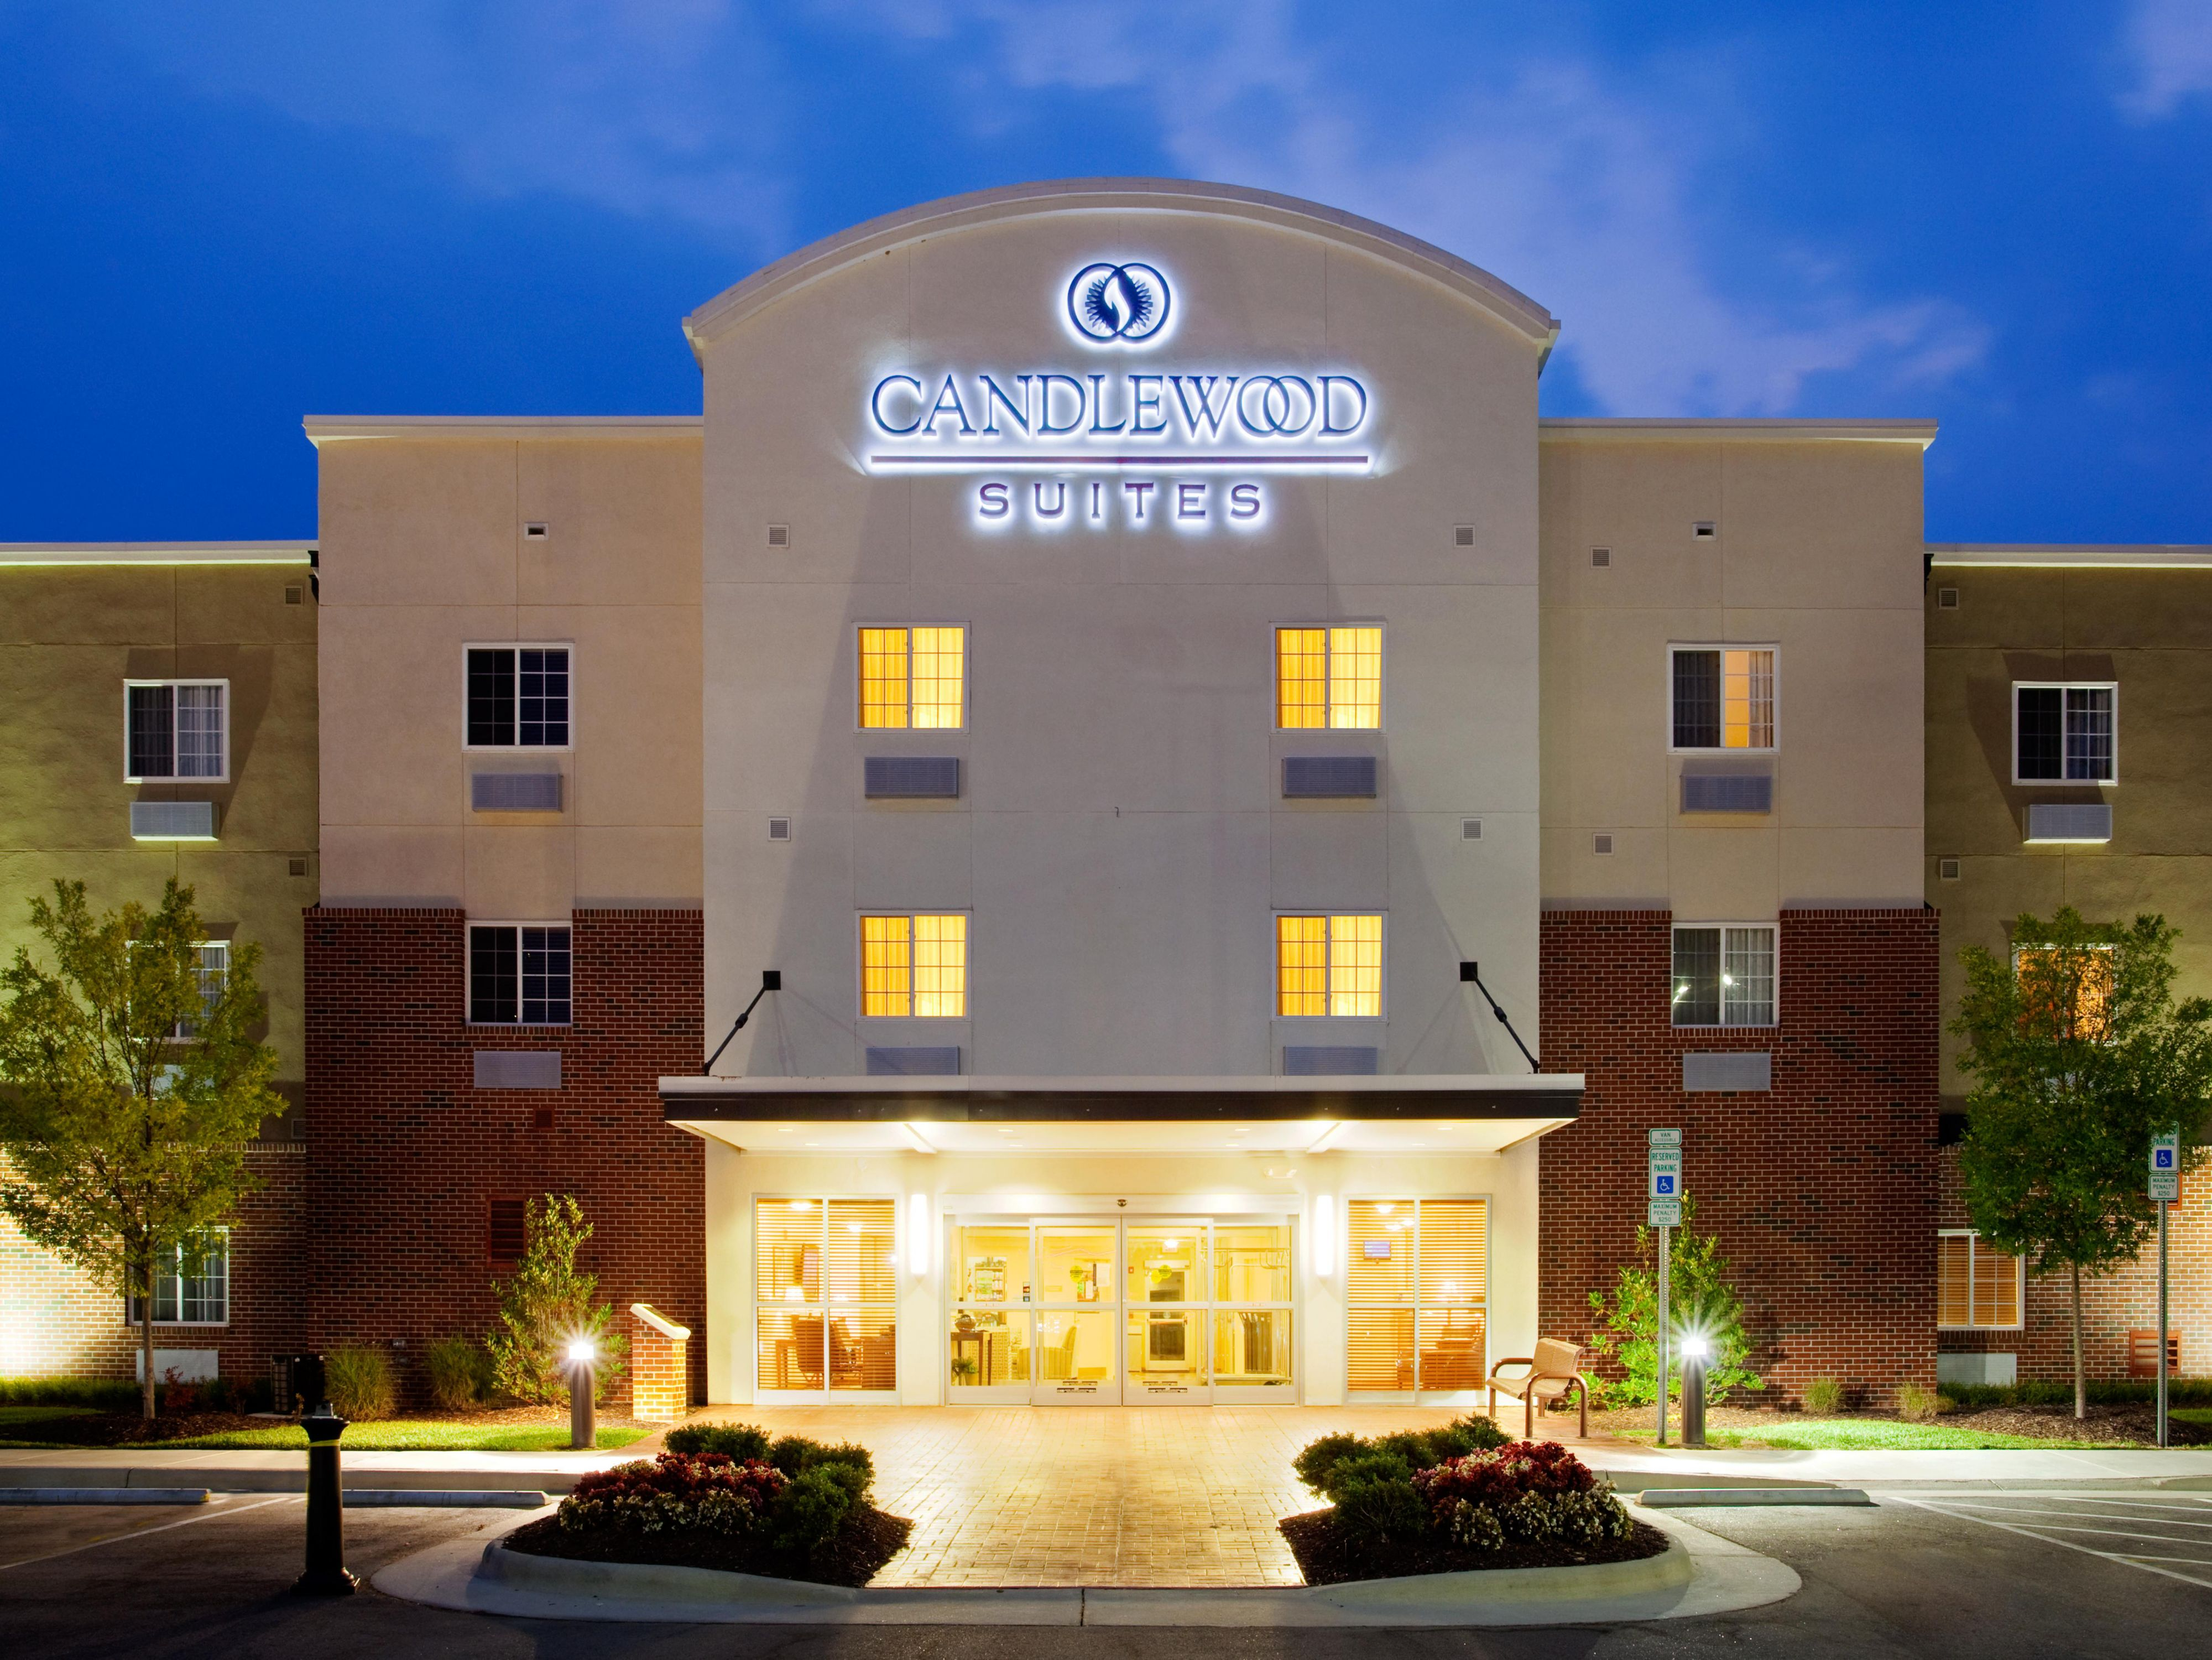 Hotel Wilson North Carolina 2018 World S Best Hotels